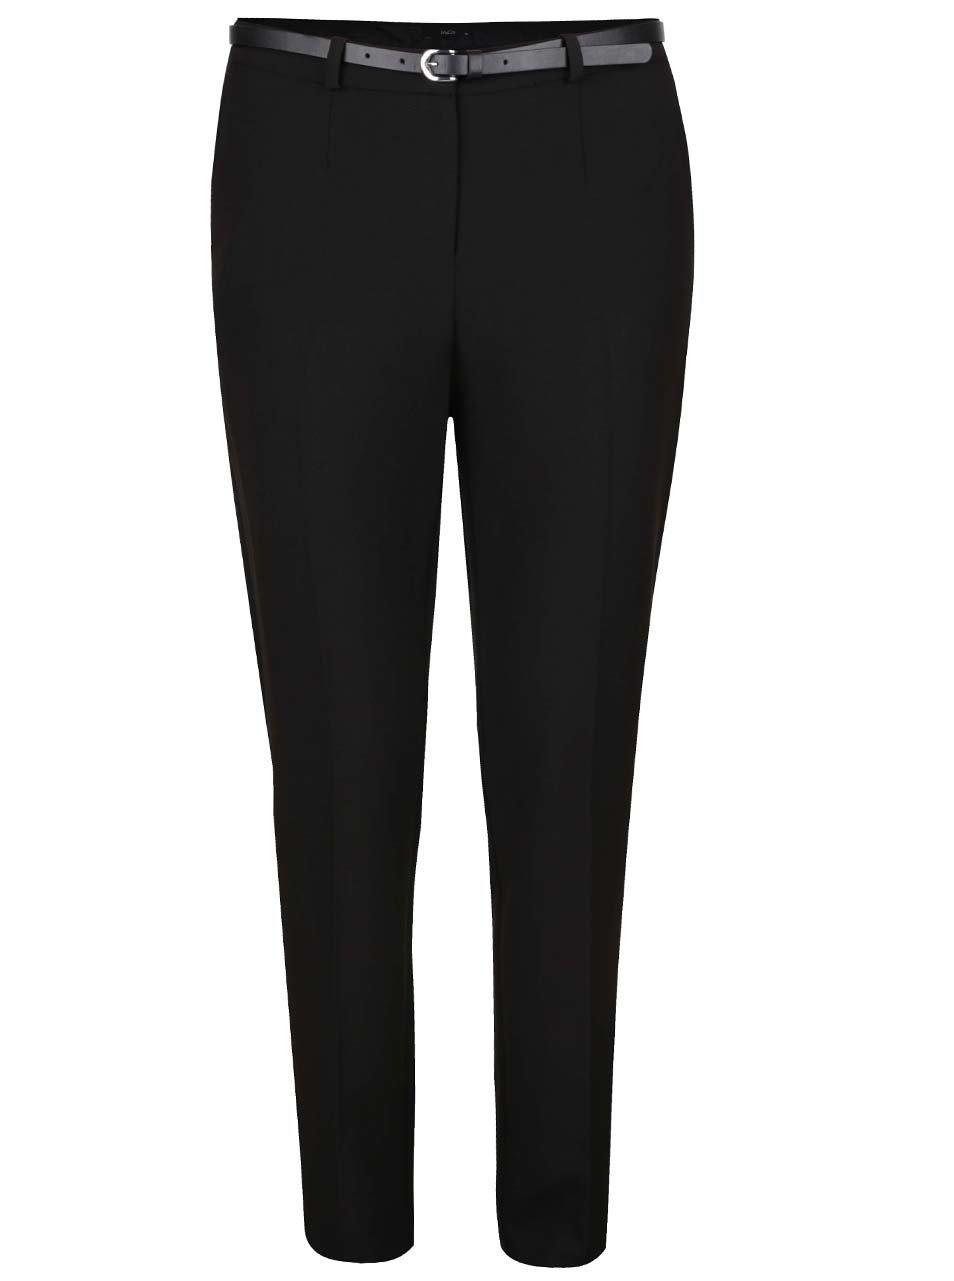 8880dde2473d Čierne dámske formálne nohavice s opaskom M Co